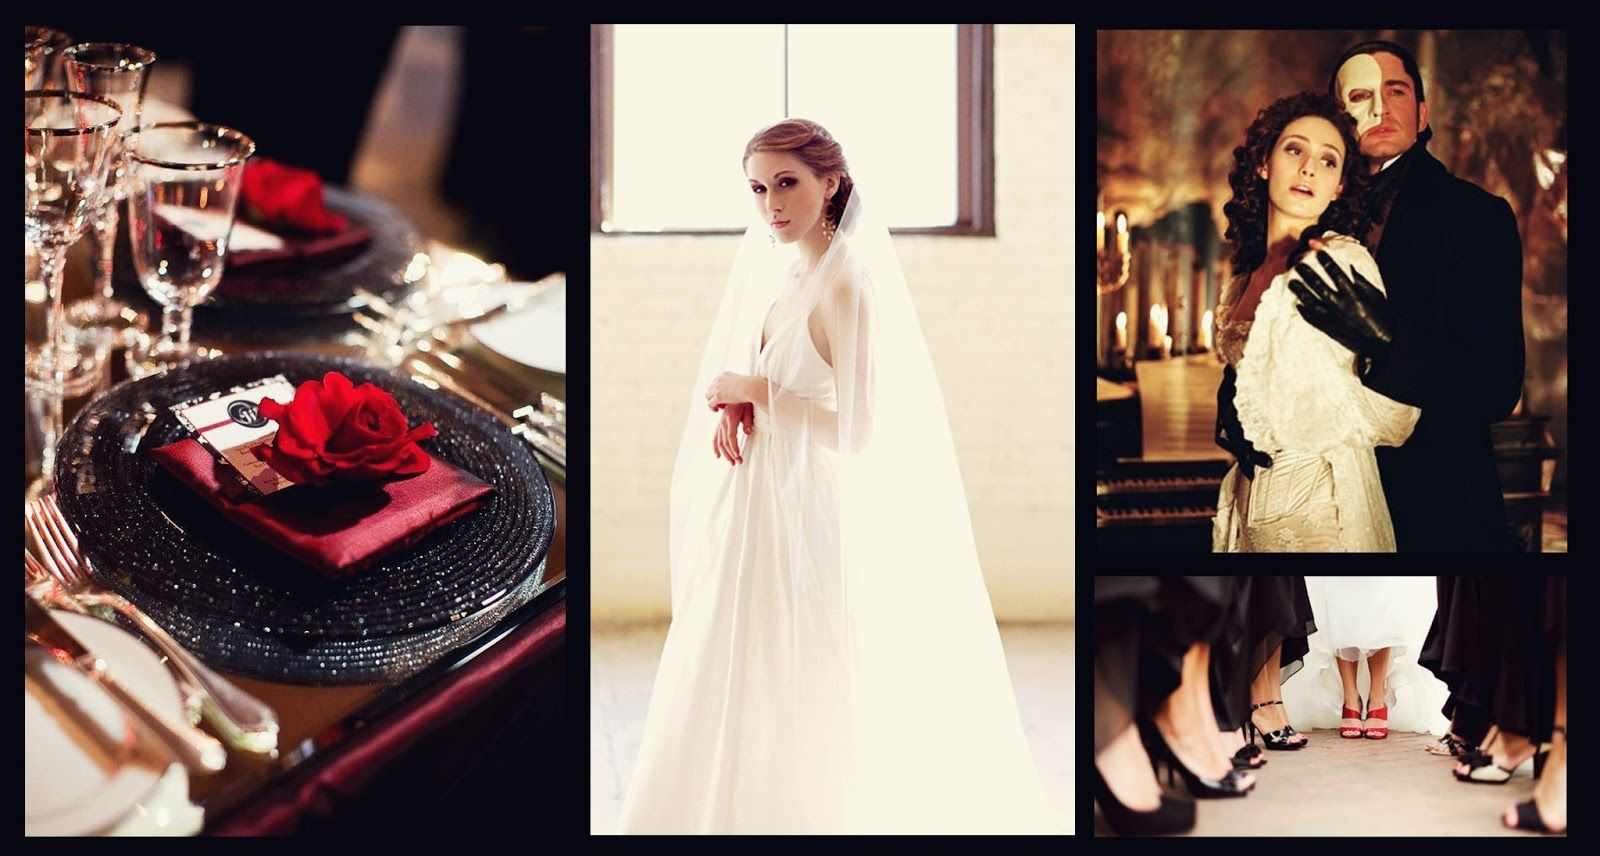 Old Fashioned Phantom Of The Opera Wedding Theme Gallery Wedding